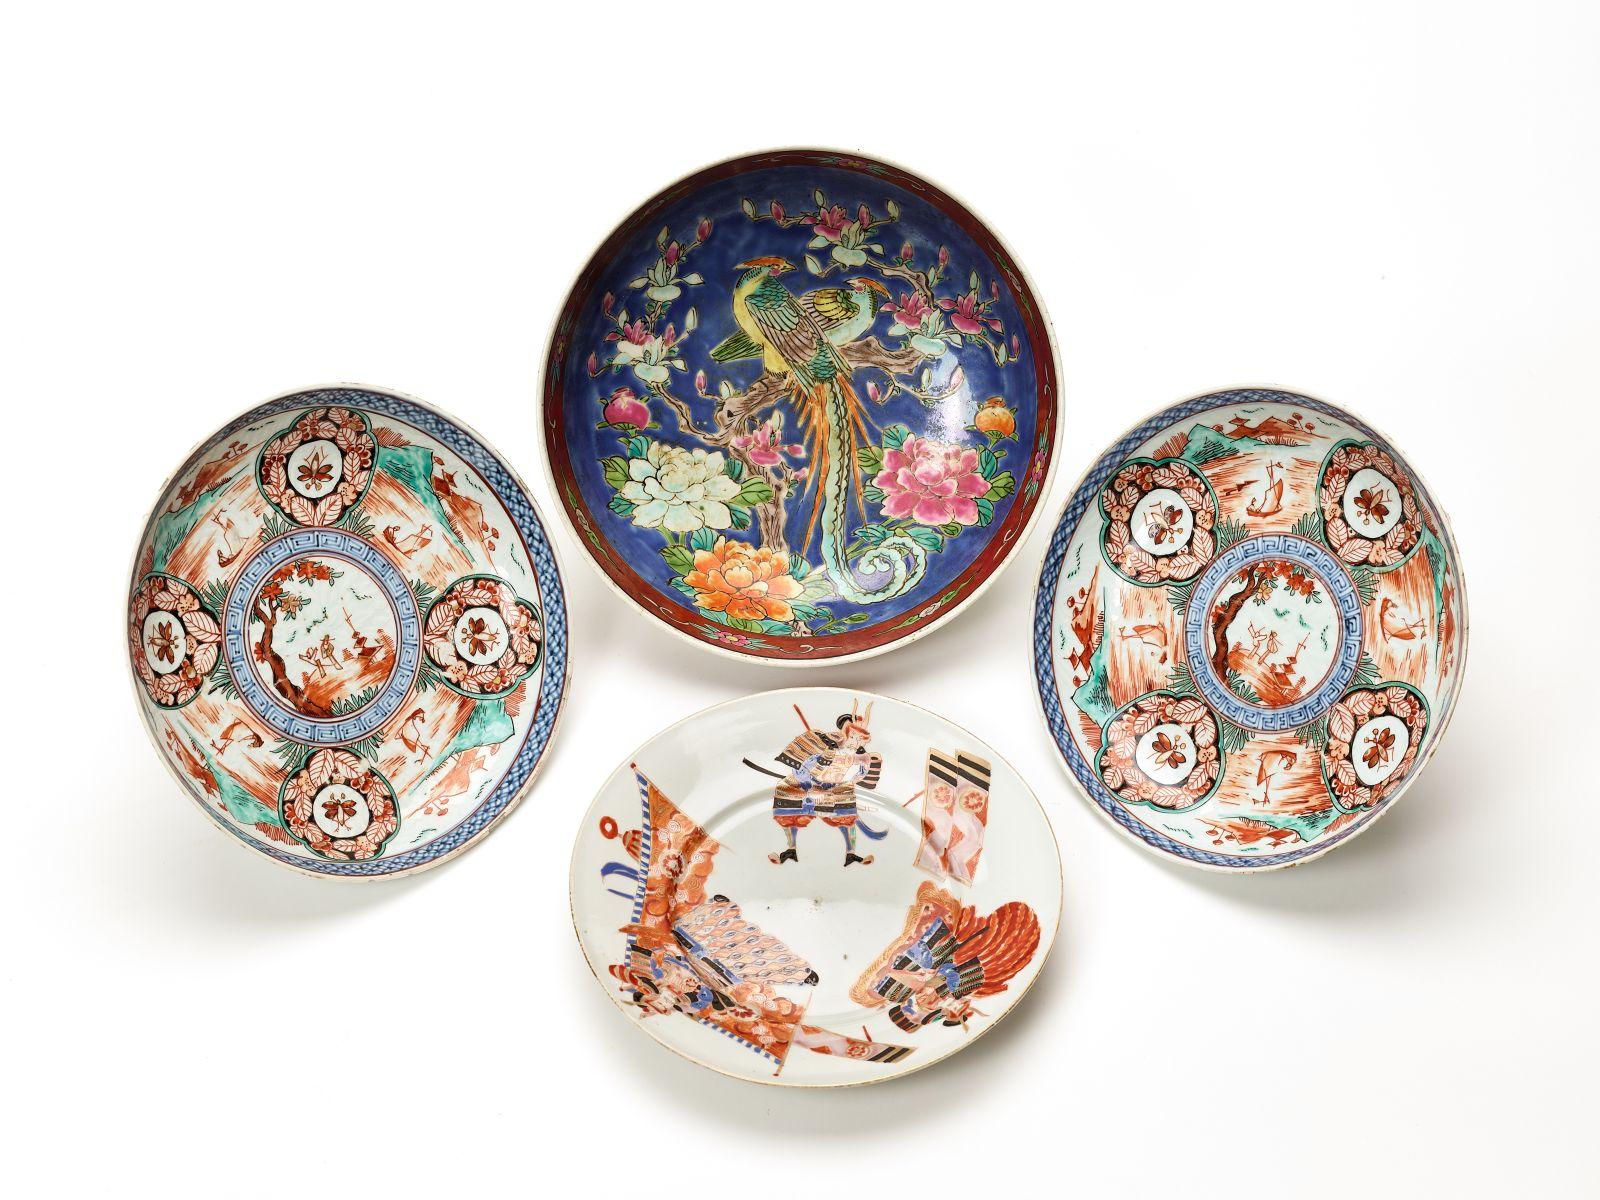 #200 Four Japanese porcelain plates and bowls   Vier japanische Porzellanteller und Schalen Image